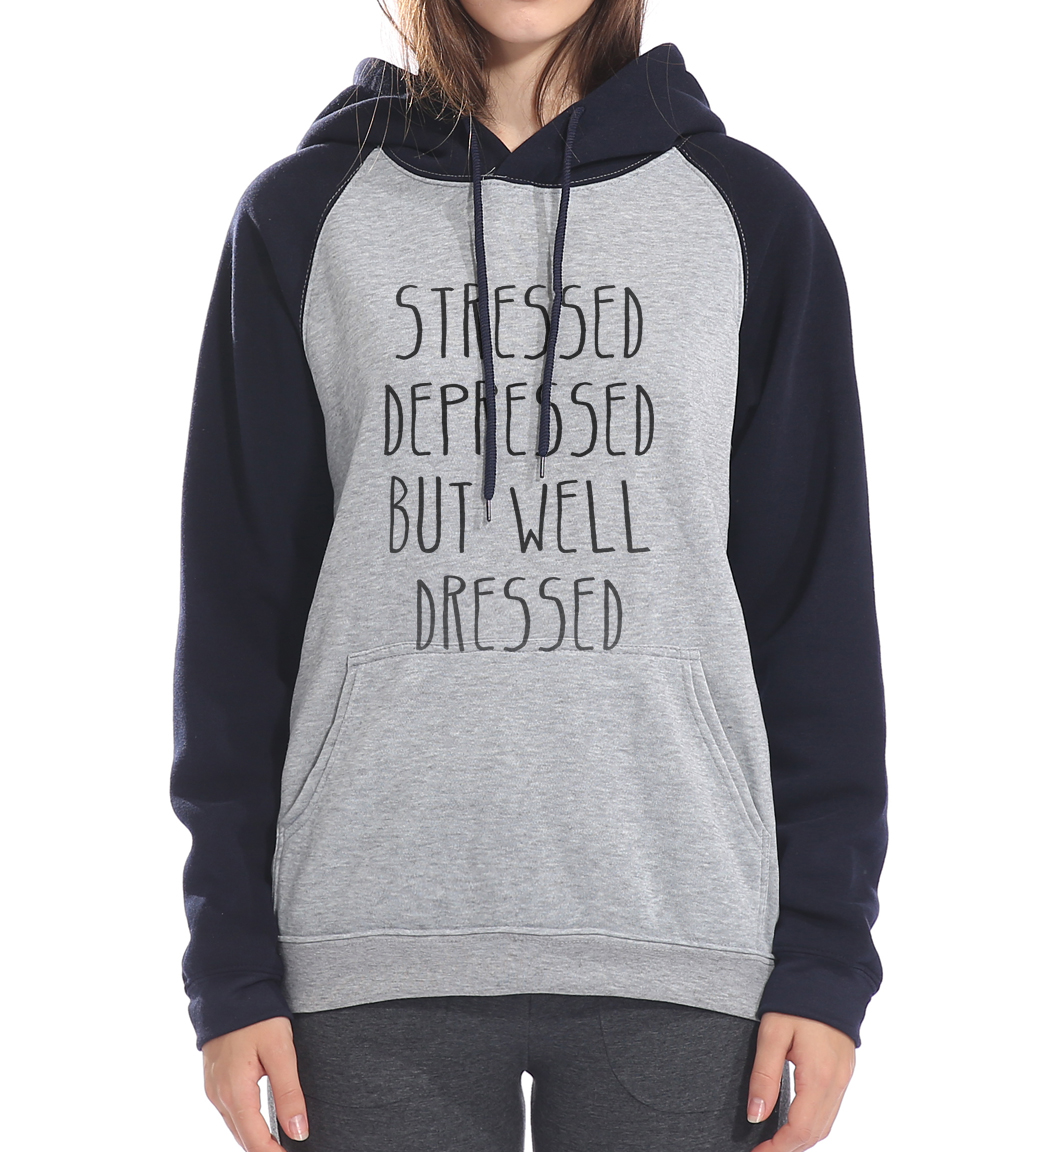 fitness sweatshirt women kpop harajuku tracksuit STRESSED DEPRESSED BUT WELL DRESSED hooded 2017 raglan sleeve femme brand hoody